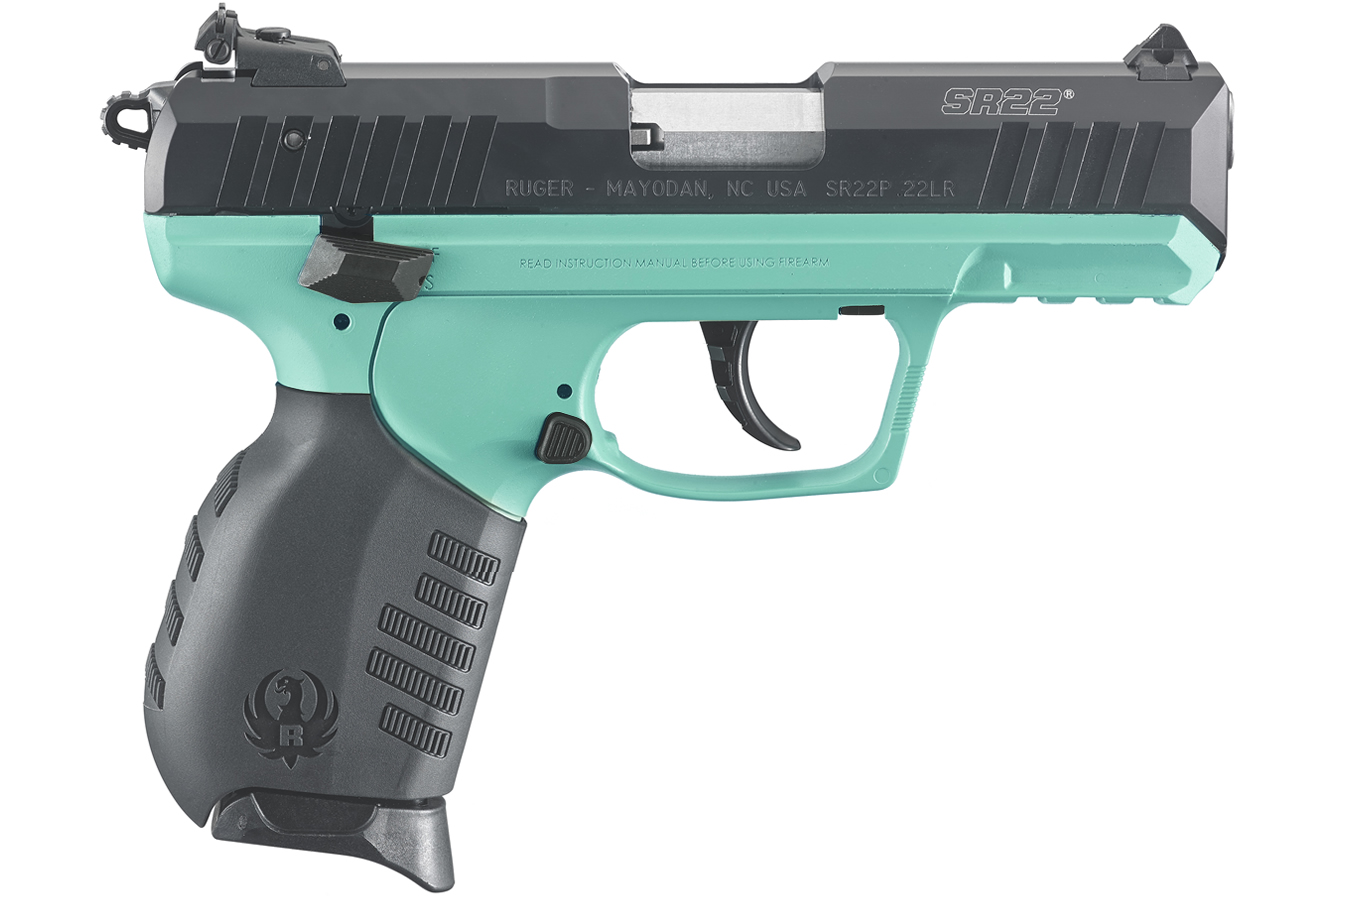 ruger pistol sr22 turquoise 22lr cerakote rimfire pistols 9mm guns sr firearms sportsman frame